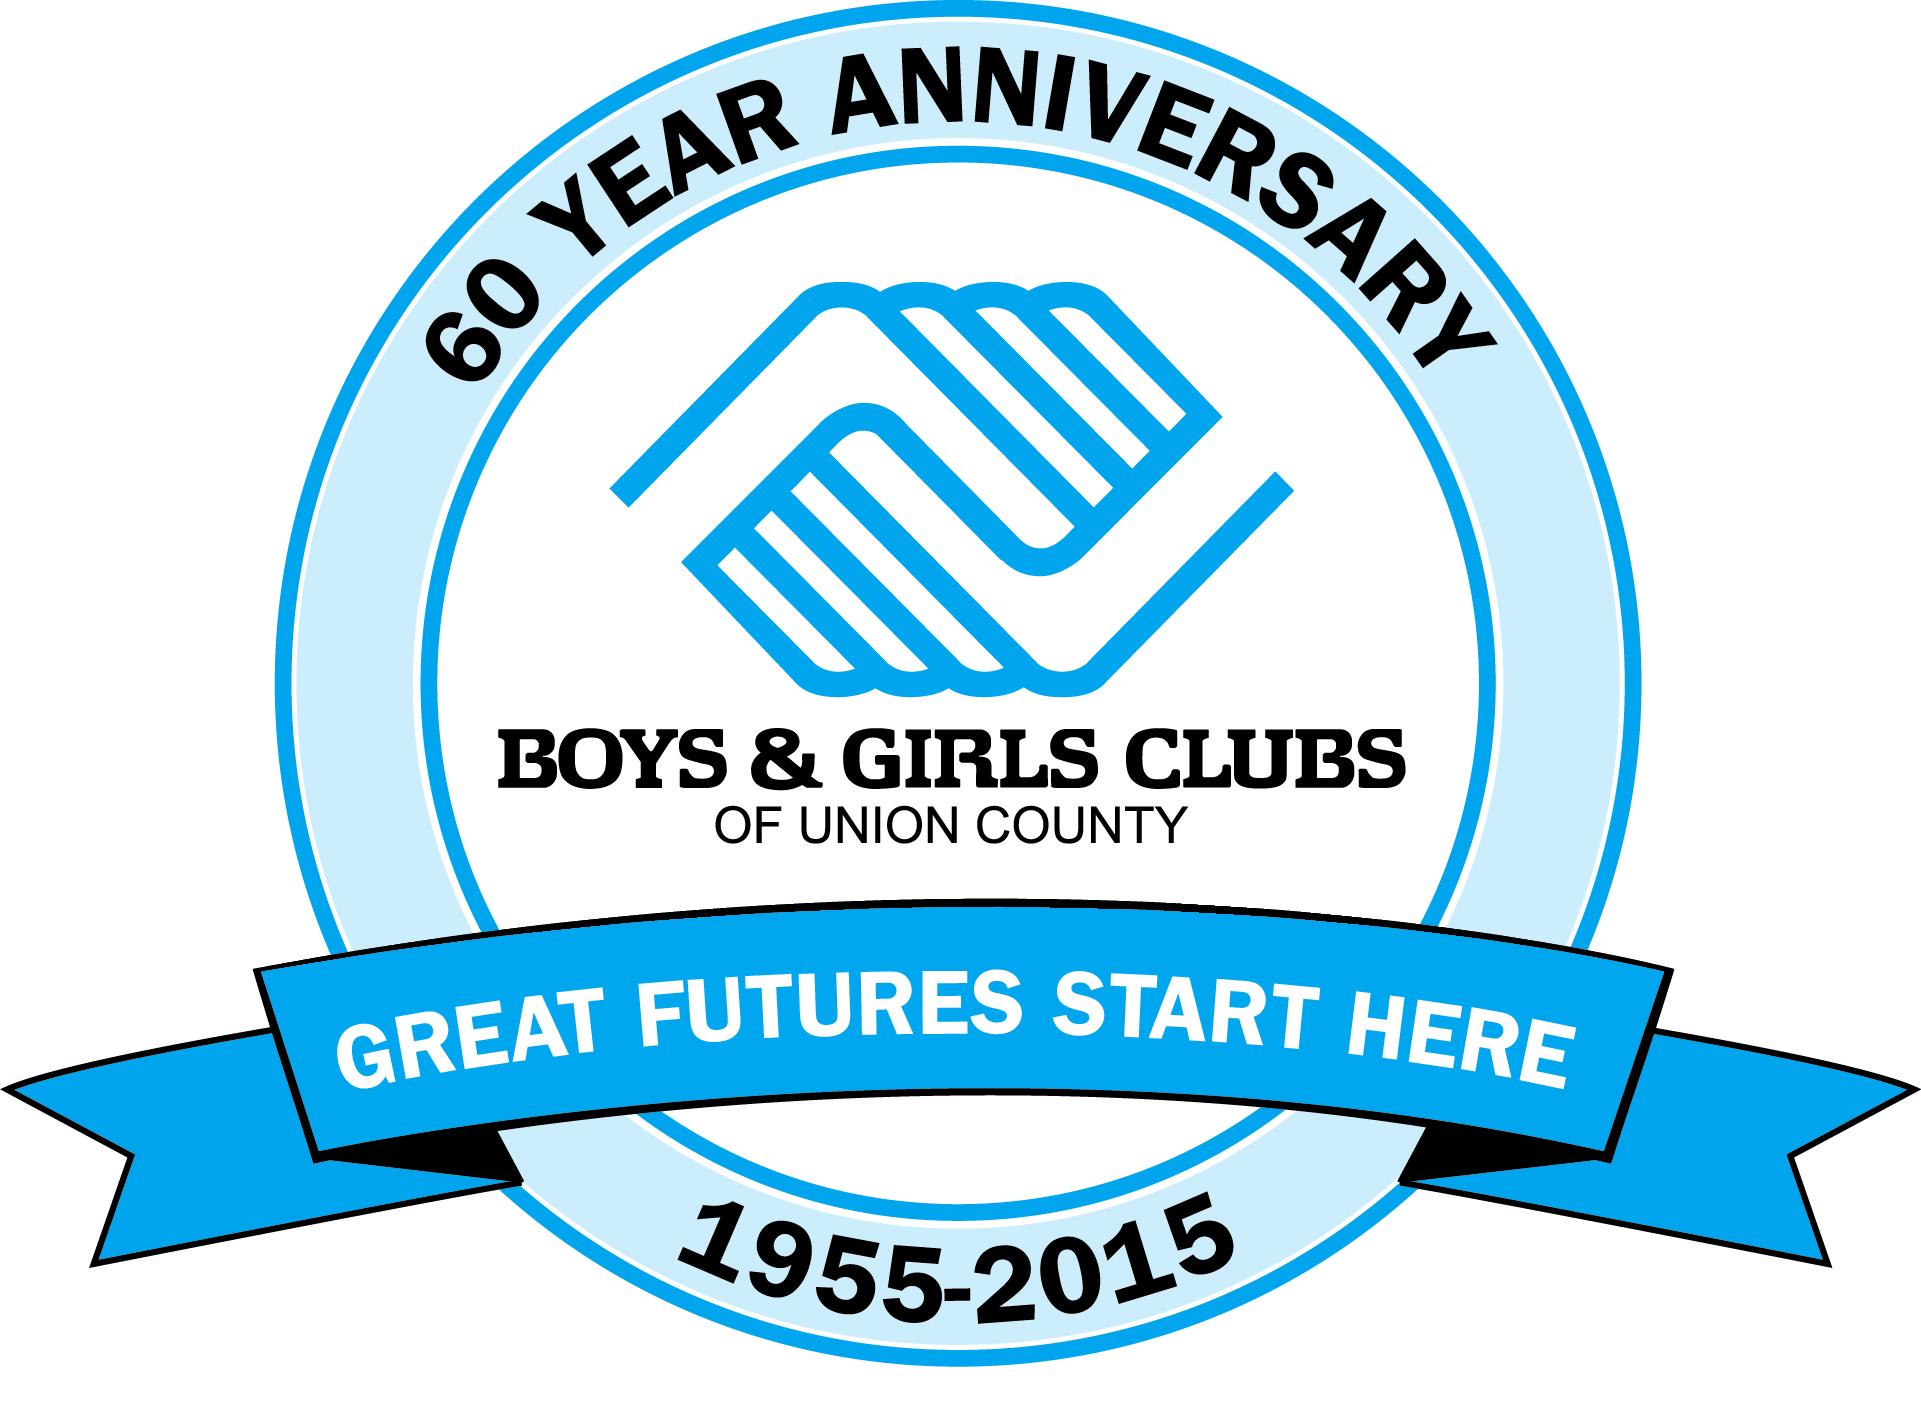 dc4161e3b35893767a9b_b_gc_logo.jpg